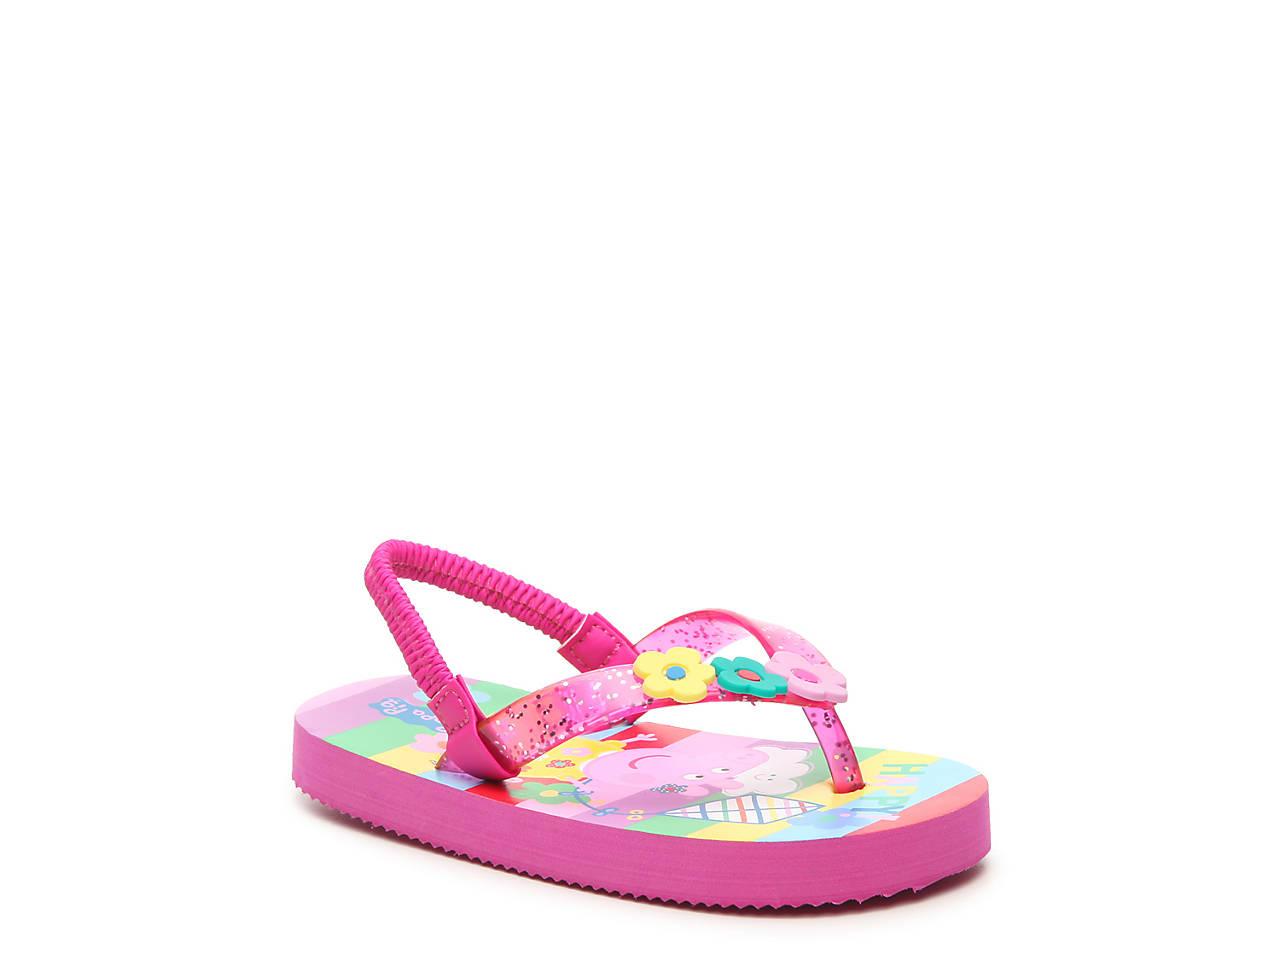 e88f537a2 Peppa Pig Peppa Toddler Flip Flop Kids Shoes